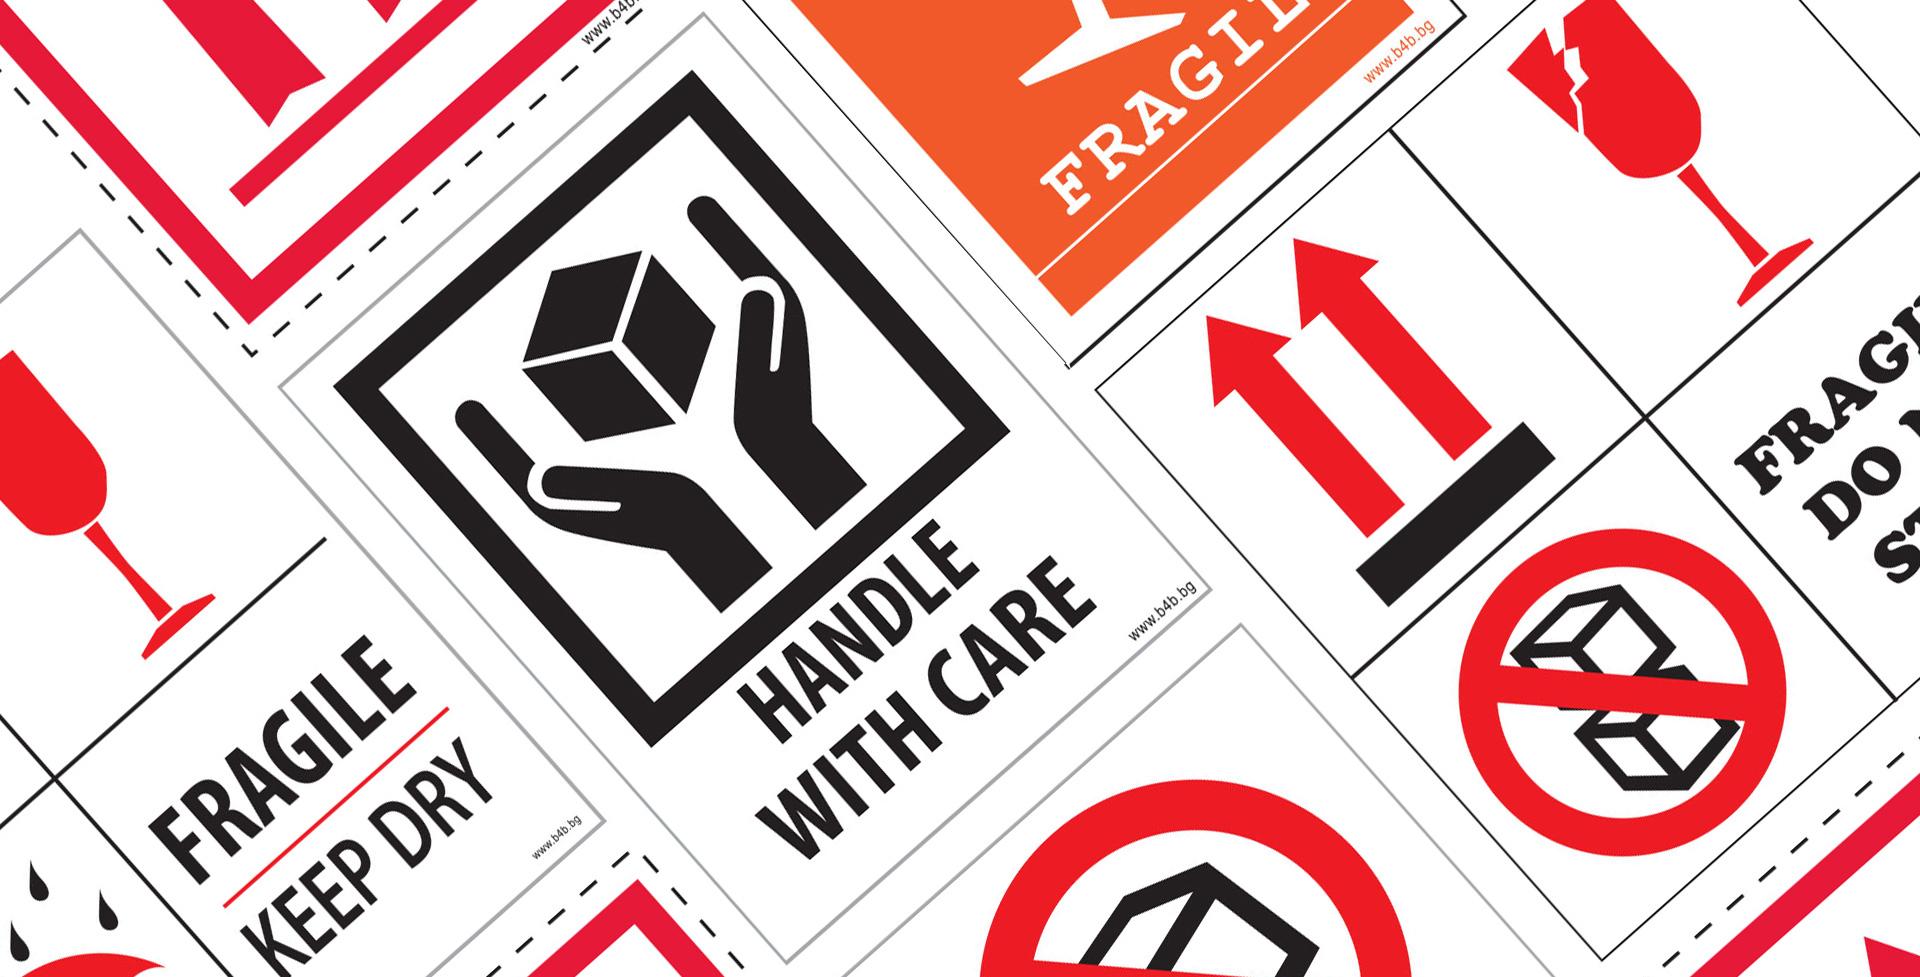 Транспортни eтикети